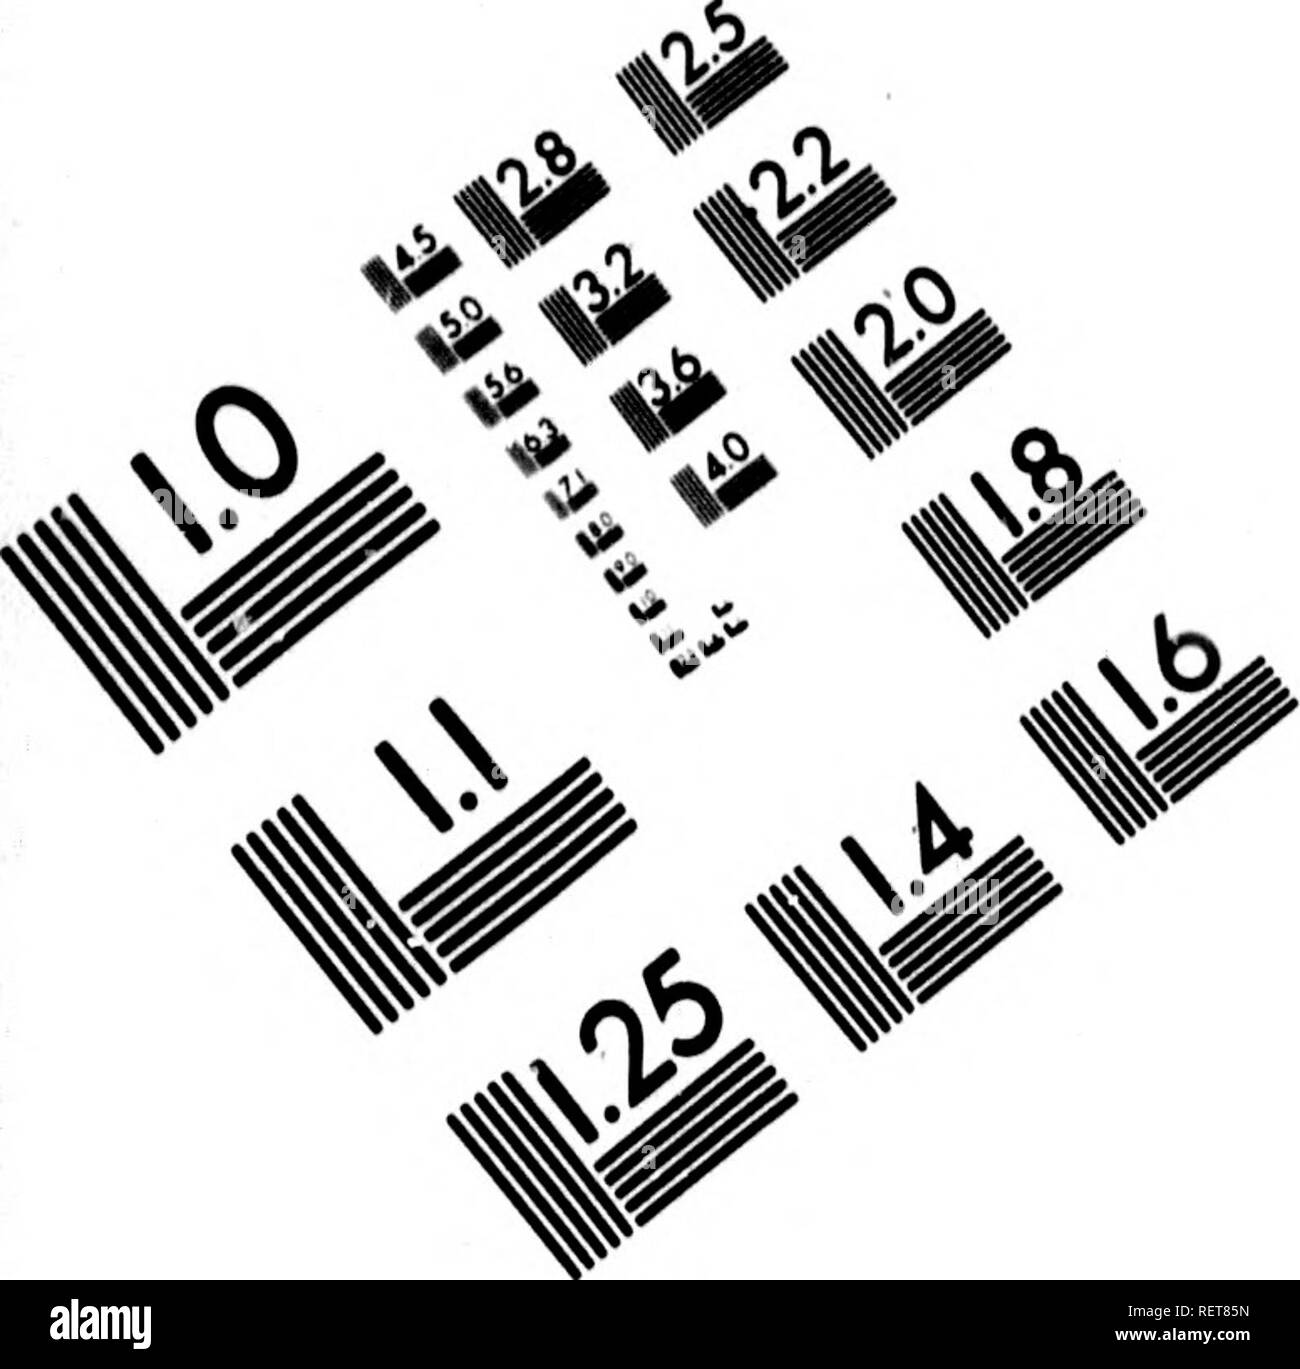 . Histoire naturelle de Buffon [microforme] : classée par ordres, genres et espèces, d'après le système de Linné avec les caractères géné riques et la nomenclature Linnéenne. Sciences naturelles; Ornithologie; Natural history; Ornithology. IMAGE EVALUATION TEST TARGET (MT-3) /. m ,!^ Piè. i< t/i 1.0 S.l 1.25 iââ IIIIM 1^ lâi 1 40 2.0 1.8 A. 111116 V] <^ /^ 7 ^. Please note that these images are extracted from scanned page images that may have been digitally enhanced for readability - coloration and appearance of these illustrations may not perfectly resemble the original work.. Castel,  - Stock Image